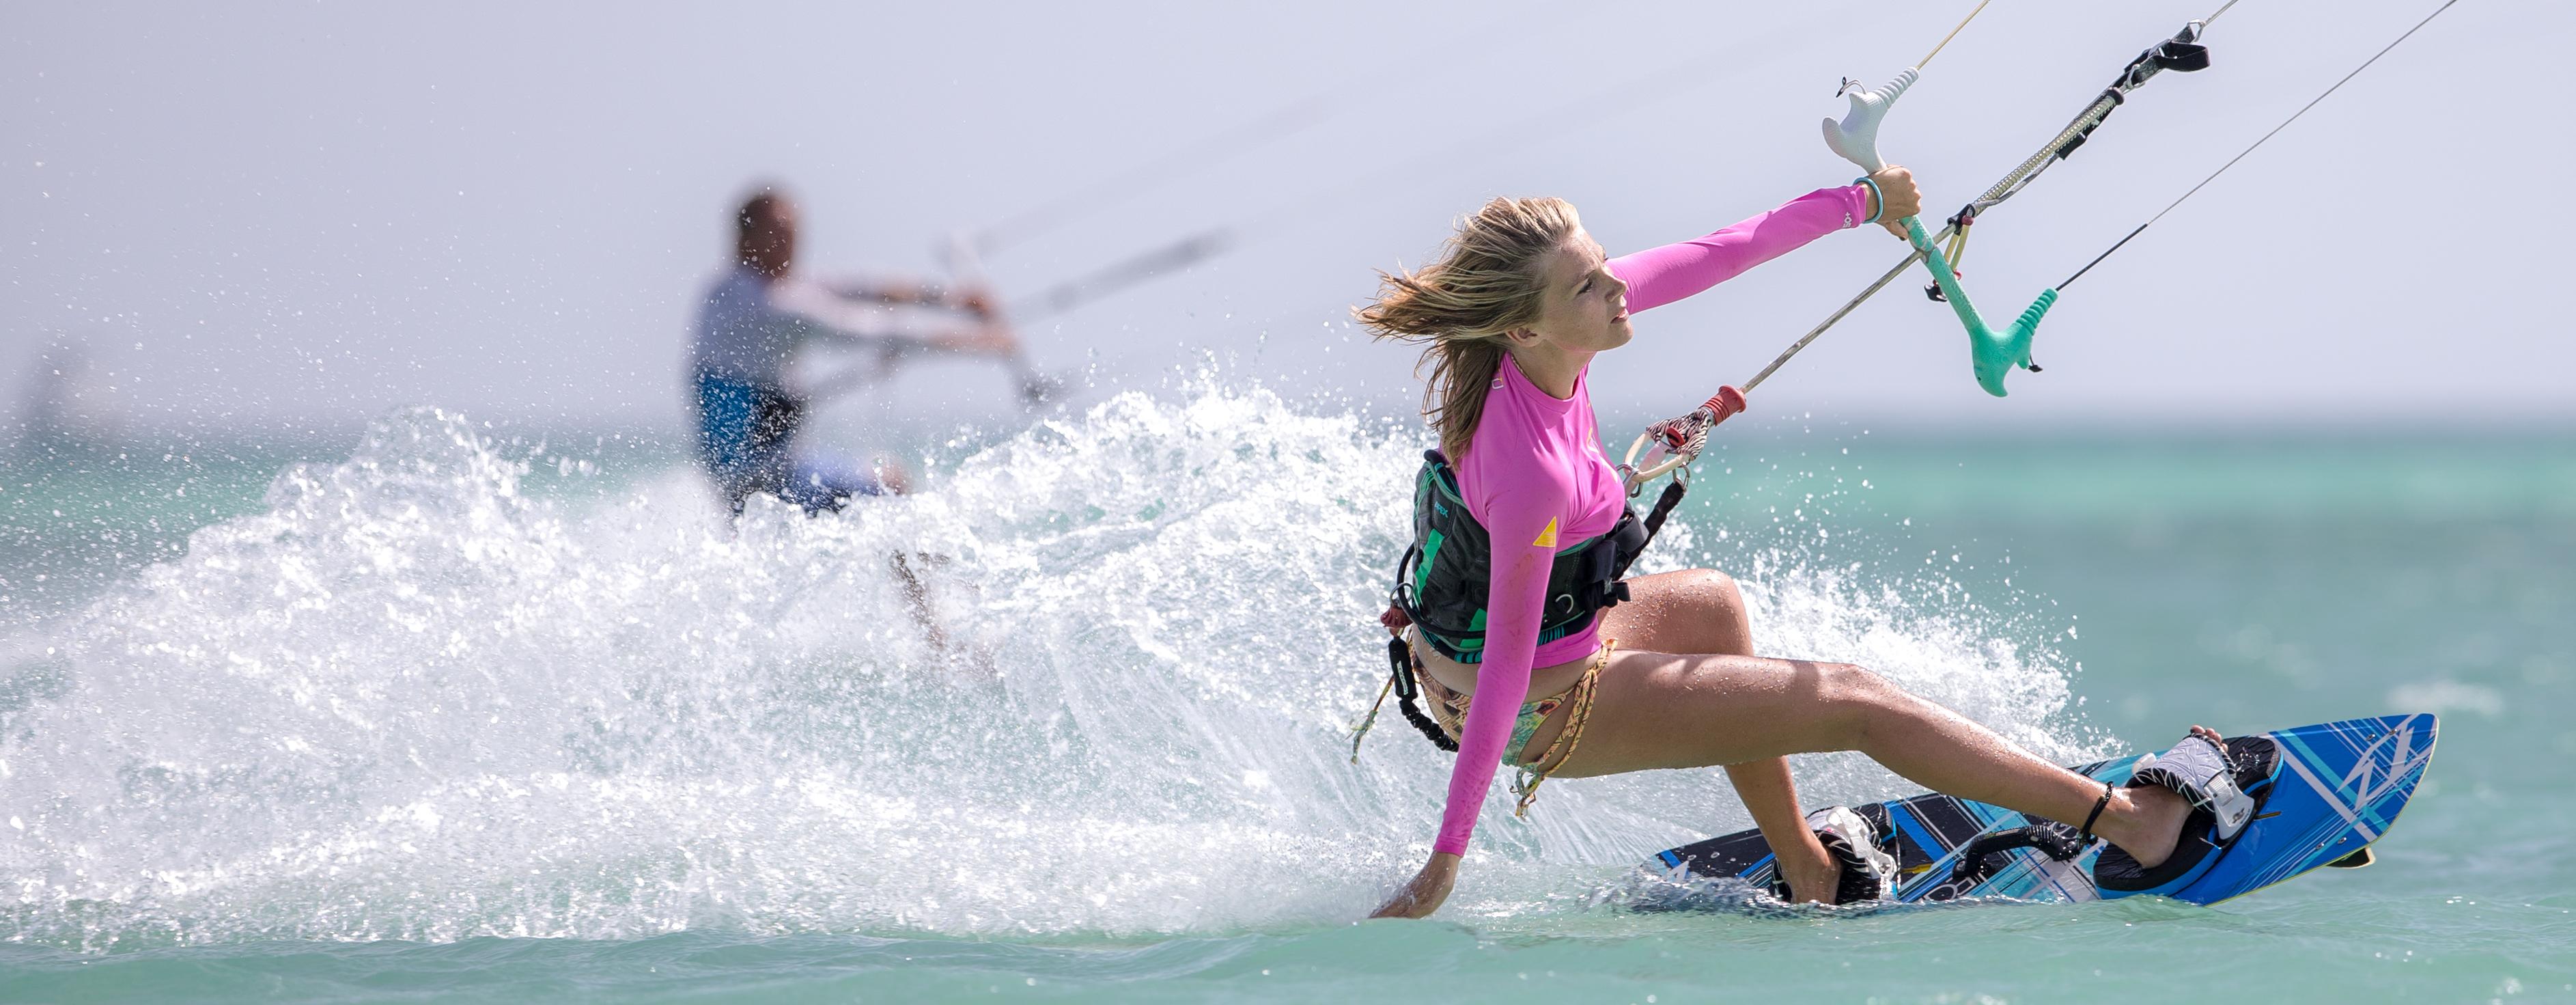 A73Q1770-1-2.jpg Female Kitesurfers